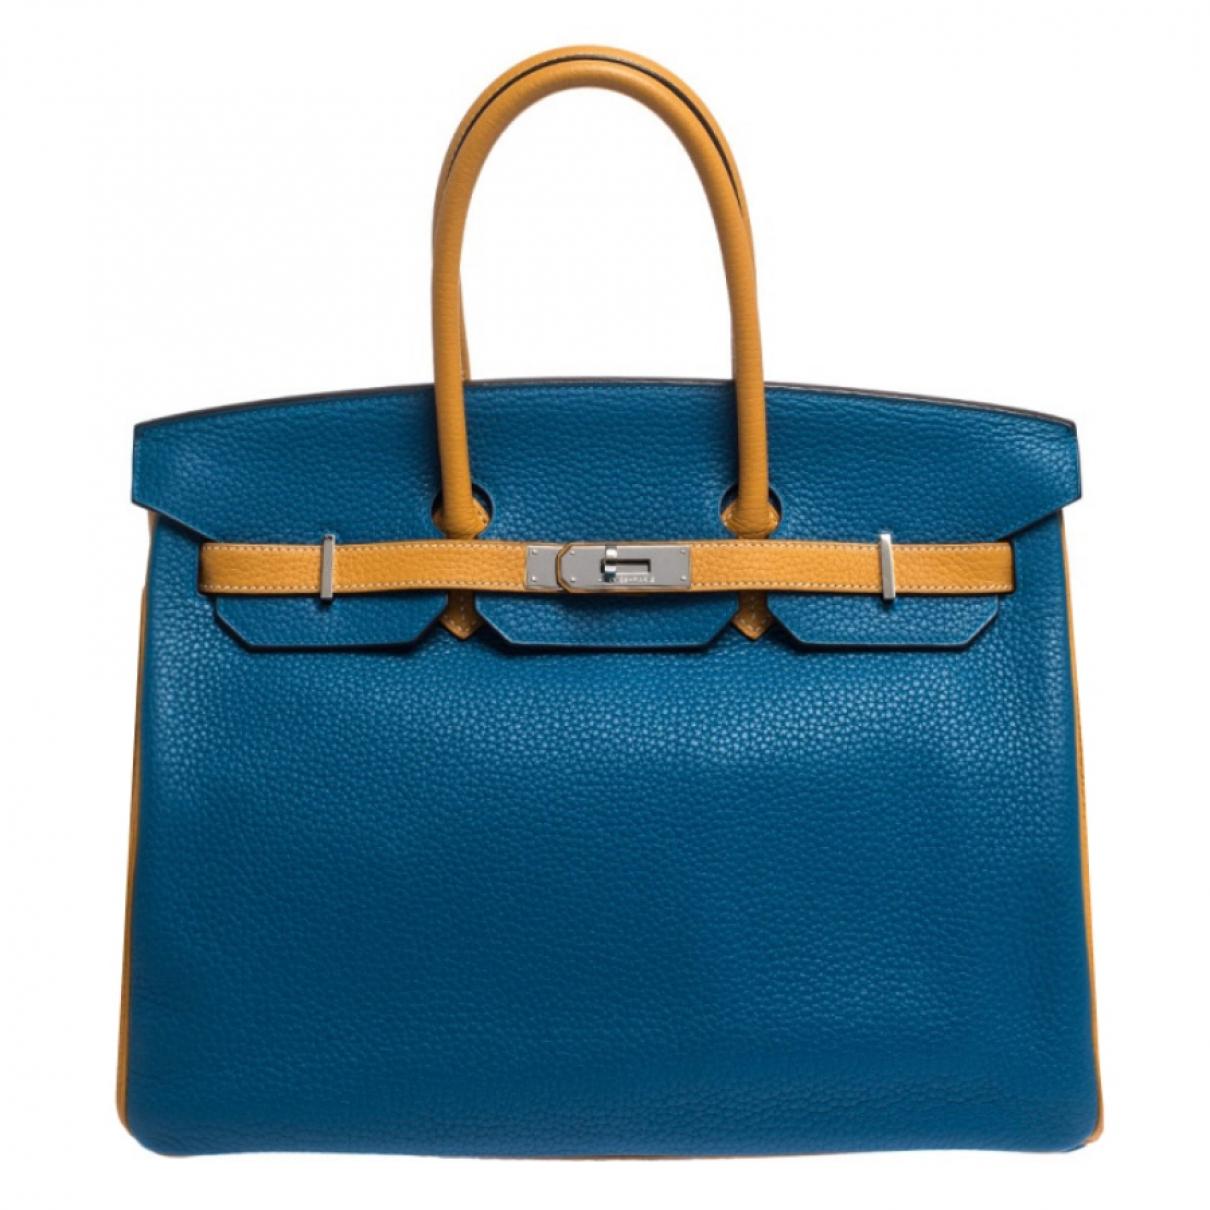 Hermes - Sac a main   pour femme en cuir - bleu